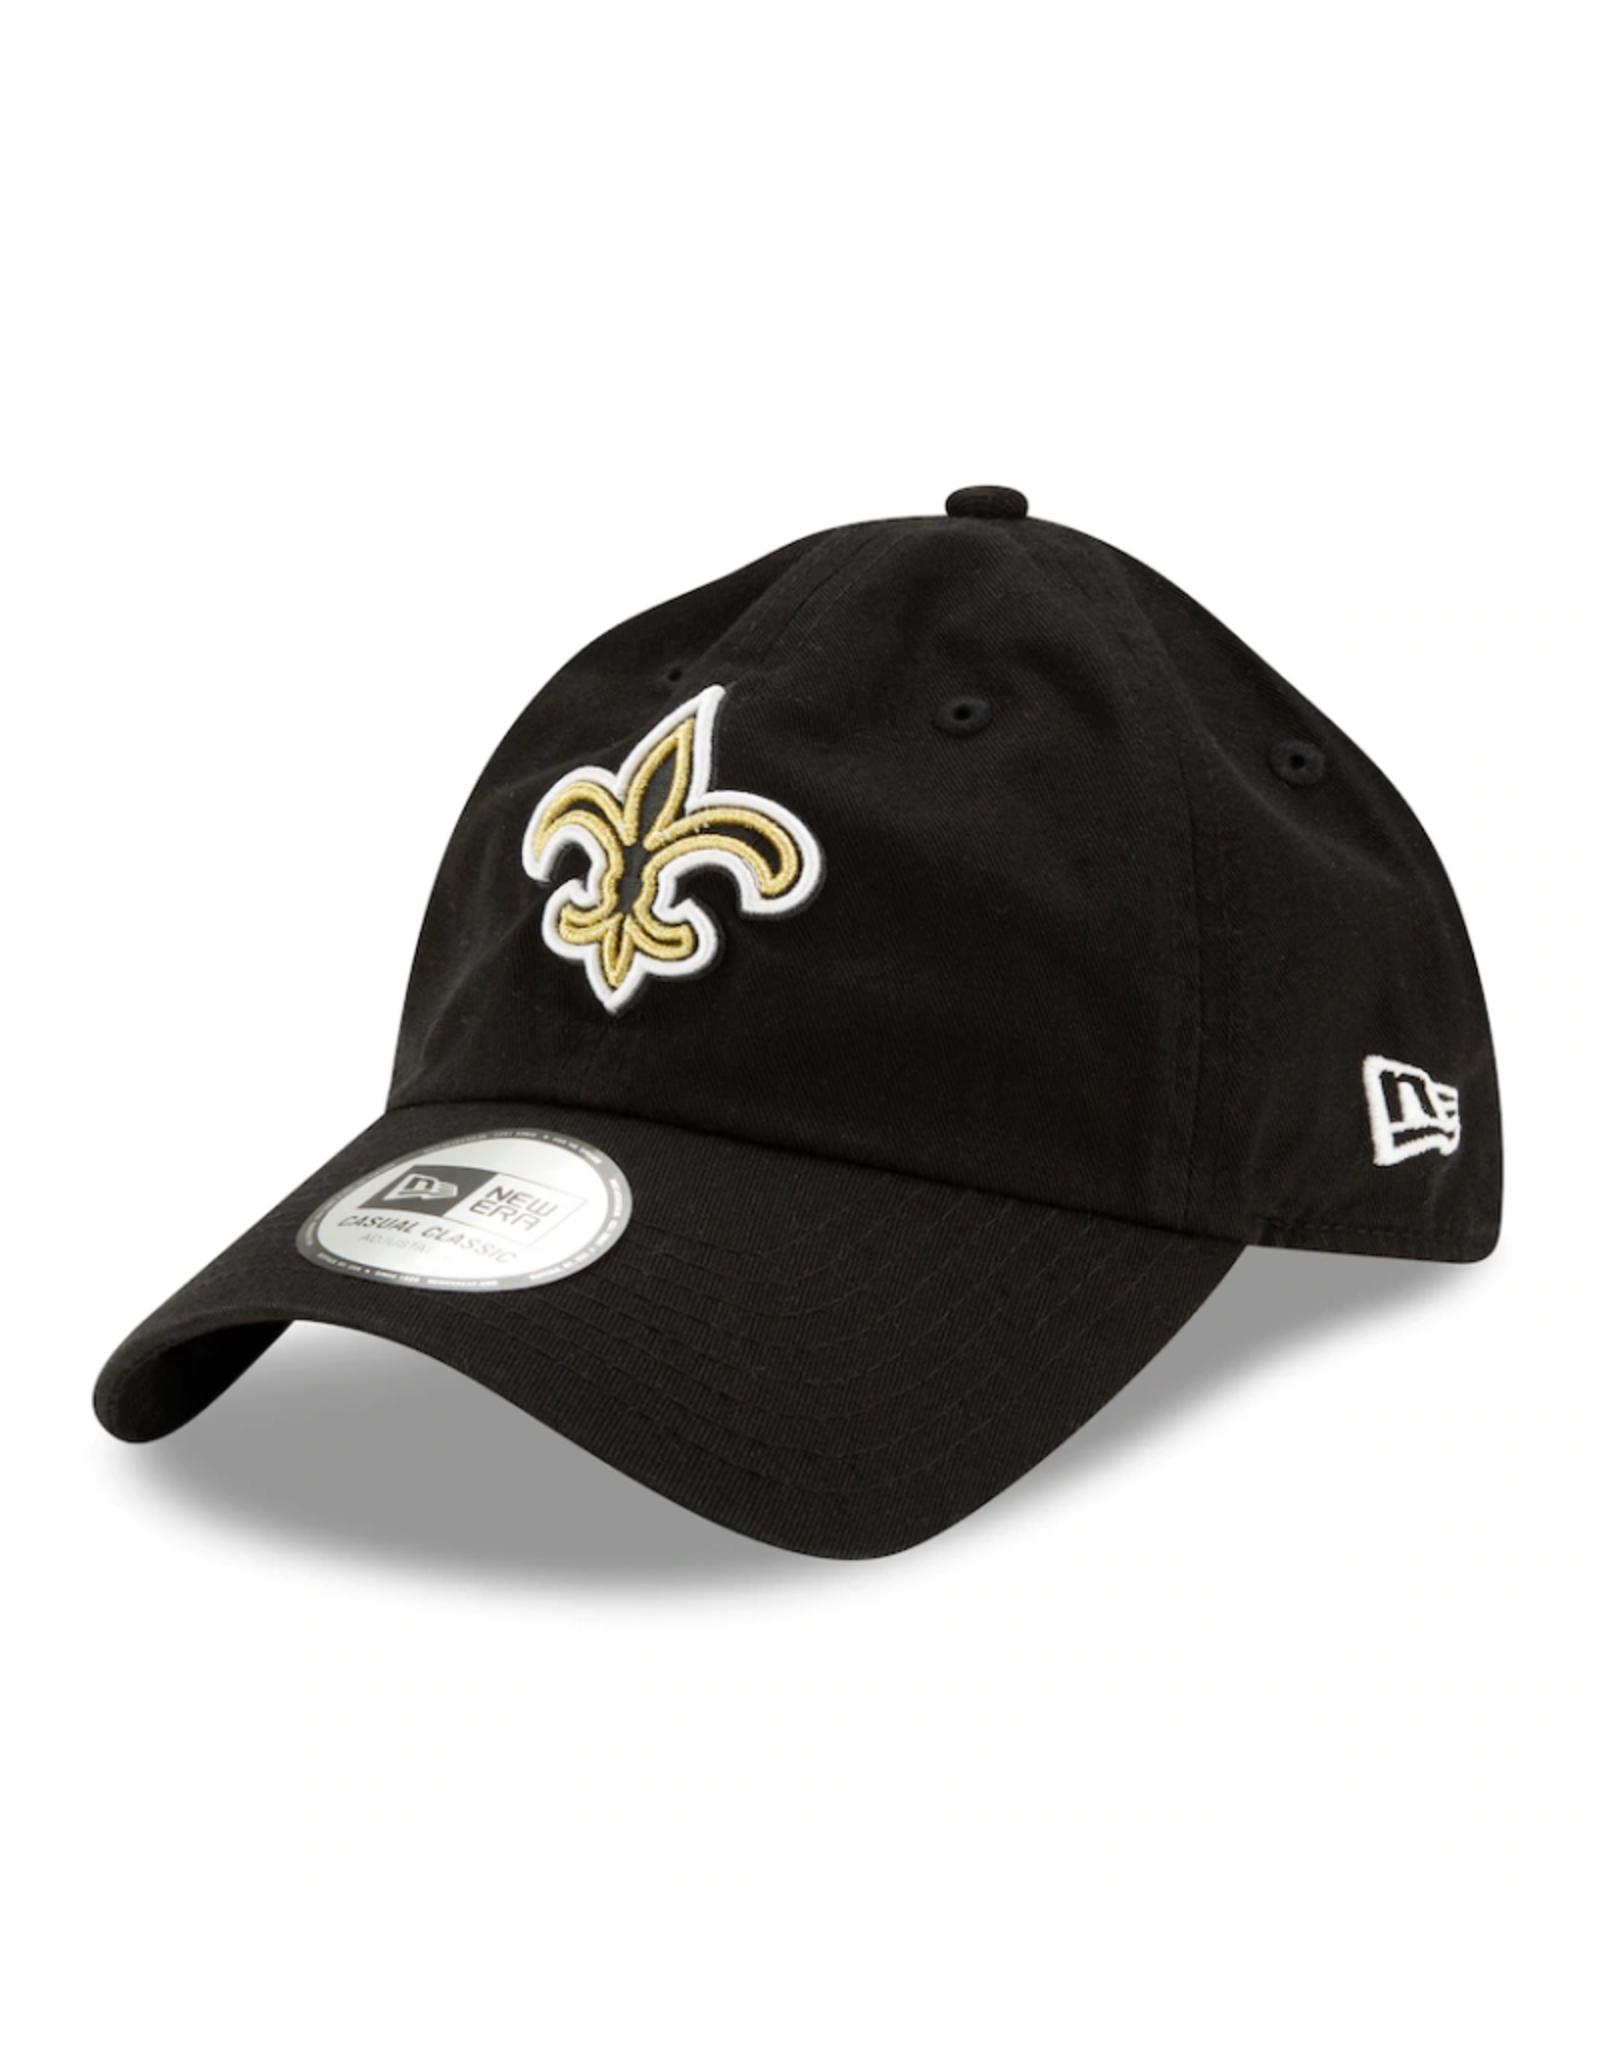 New Era '20 NFL Draft Casual Classic Hat New Orleans Saints Black Adjustable